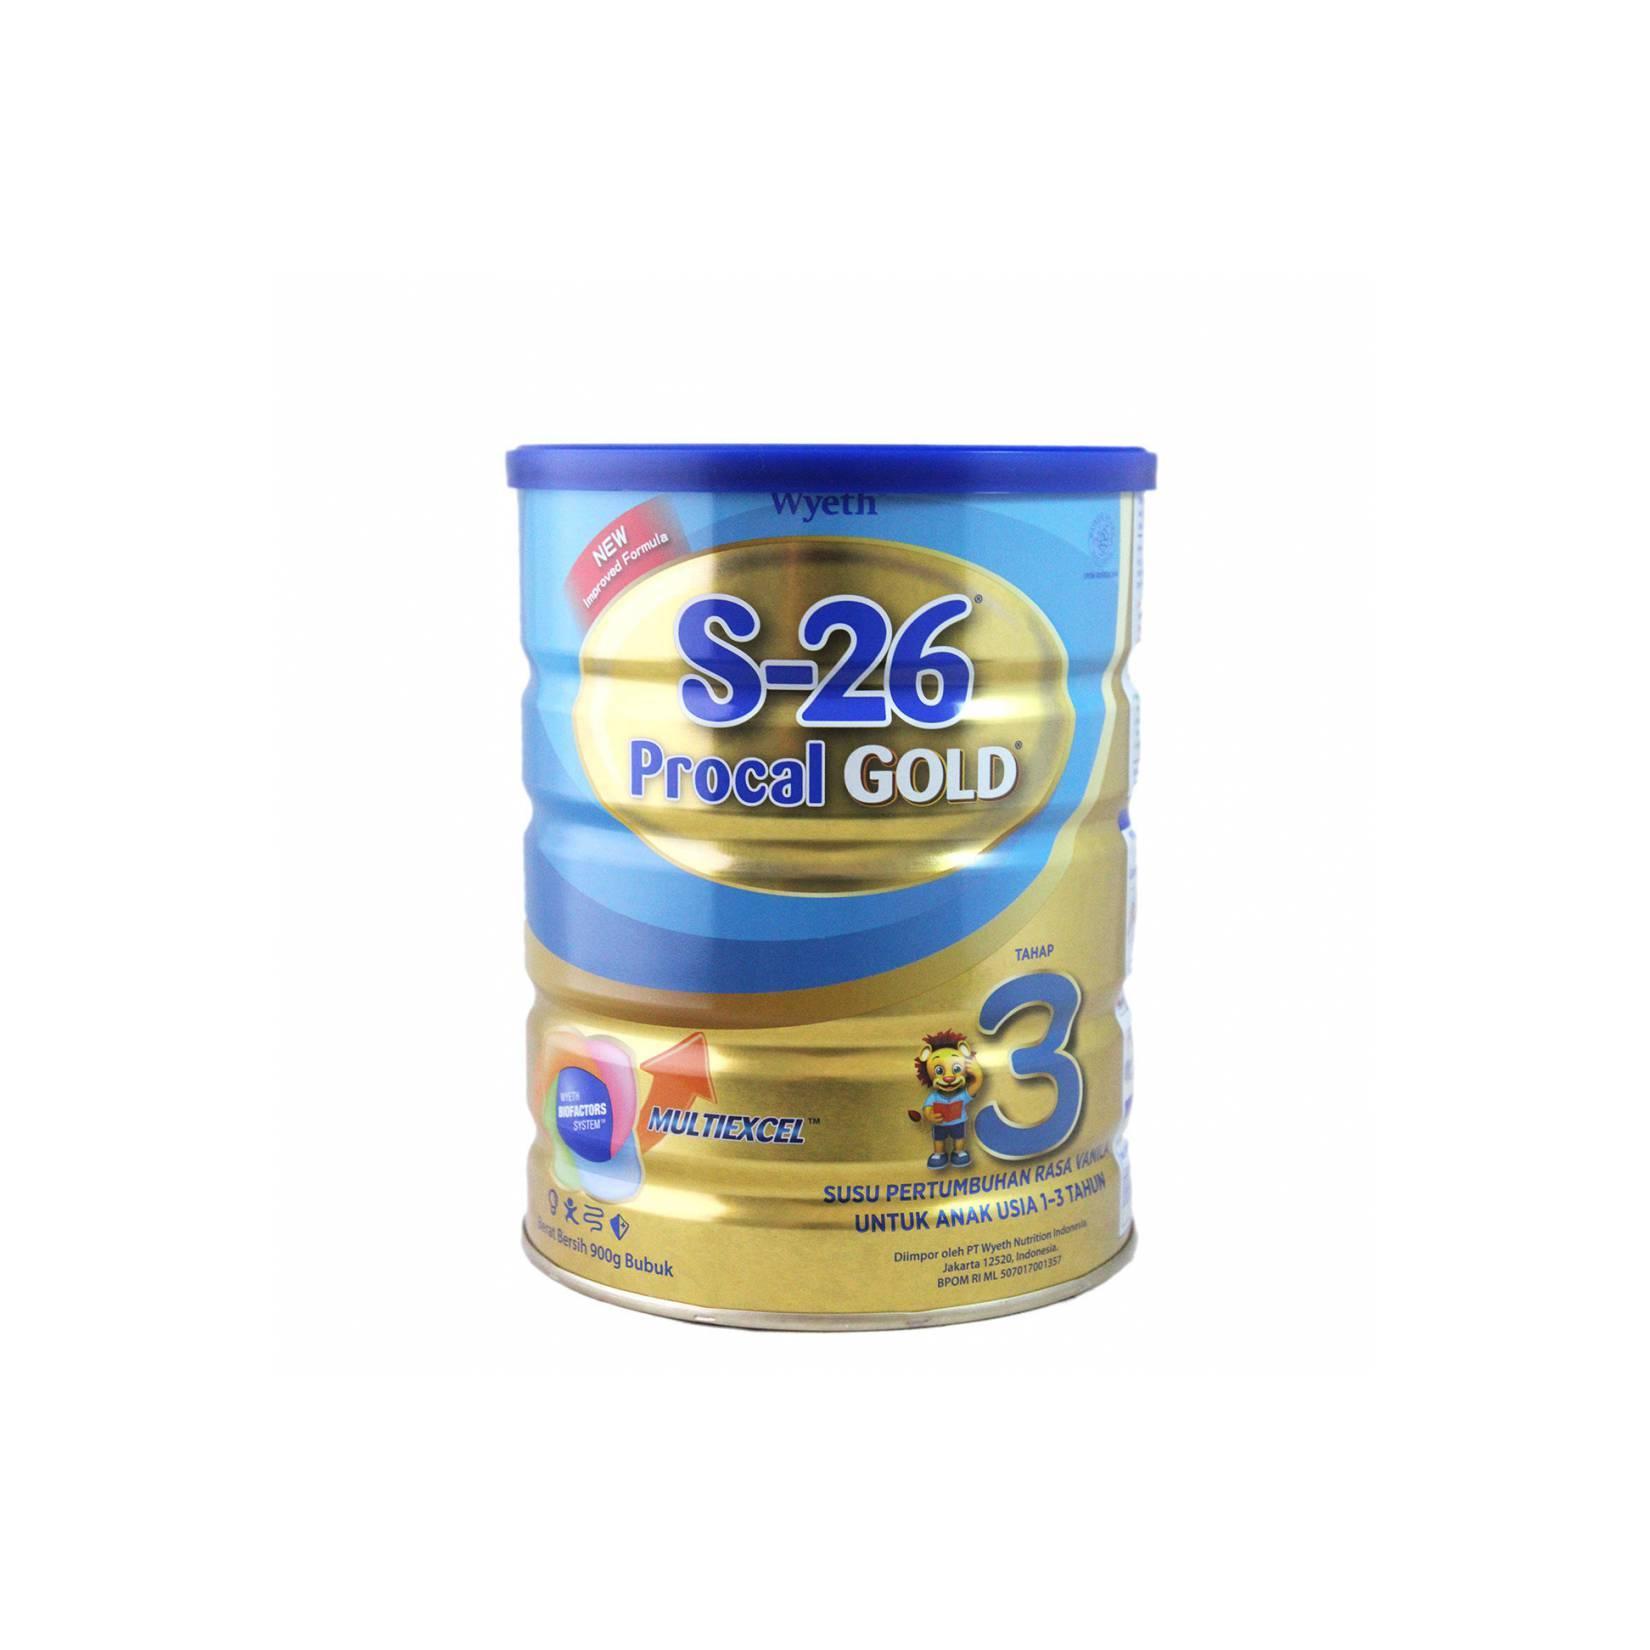 ... Gold Strawberry 100 Ml Syrup Rasa Strawberry ... - Vitabumin Madu Ikan Gabus Tumbuh Kembang Anak 130ML. Source · Foto Nutribrain nutrisi otak anak.